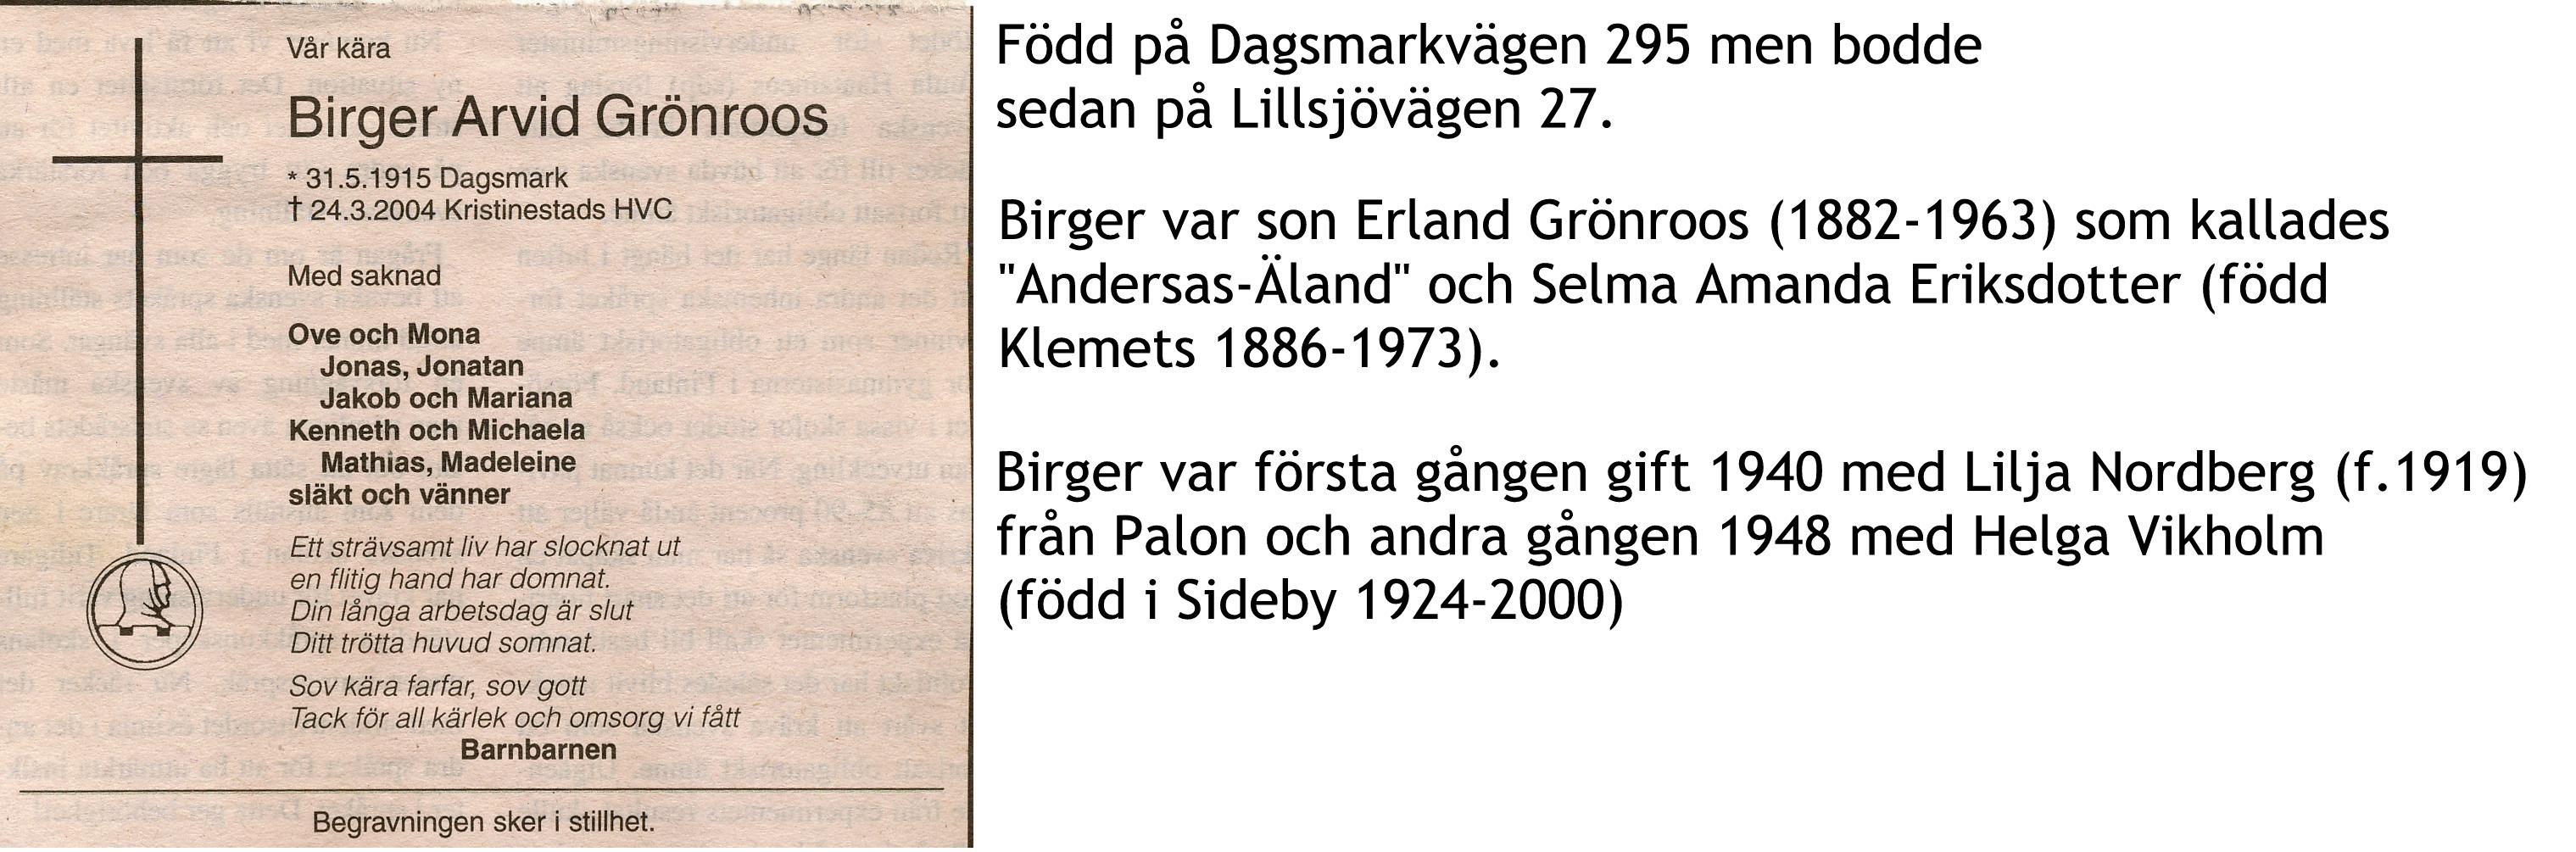 Grönroos Birger